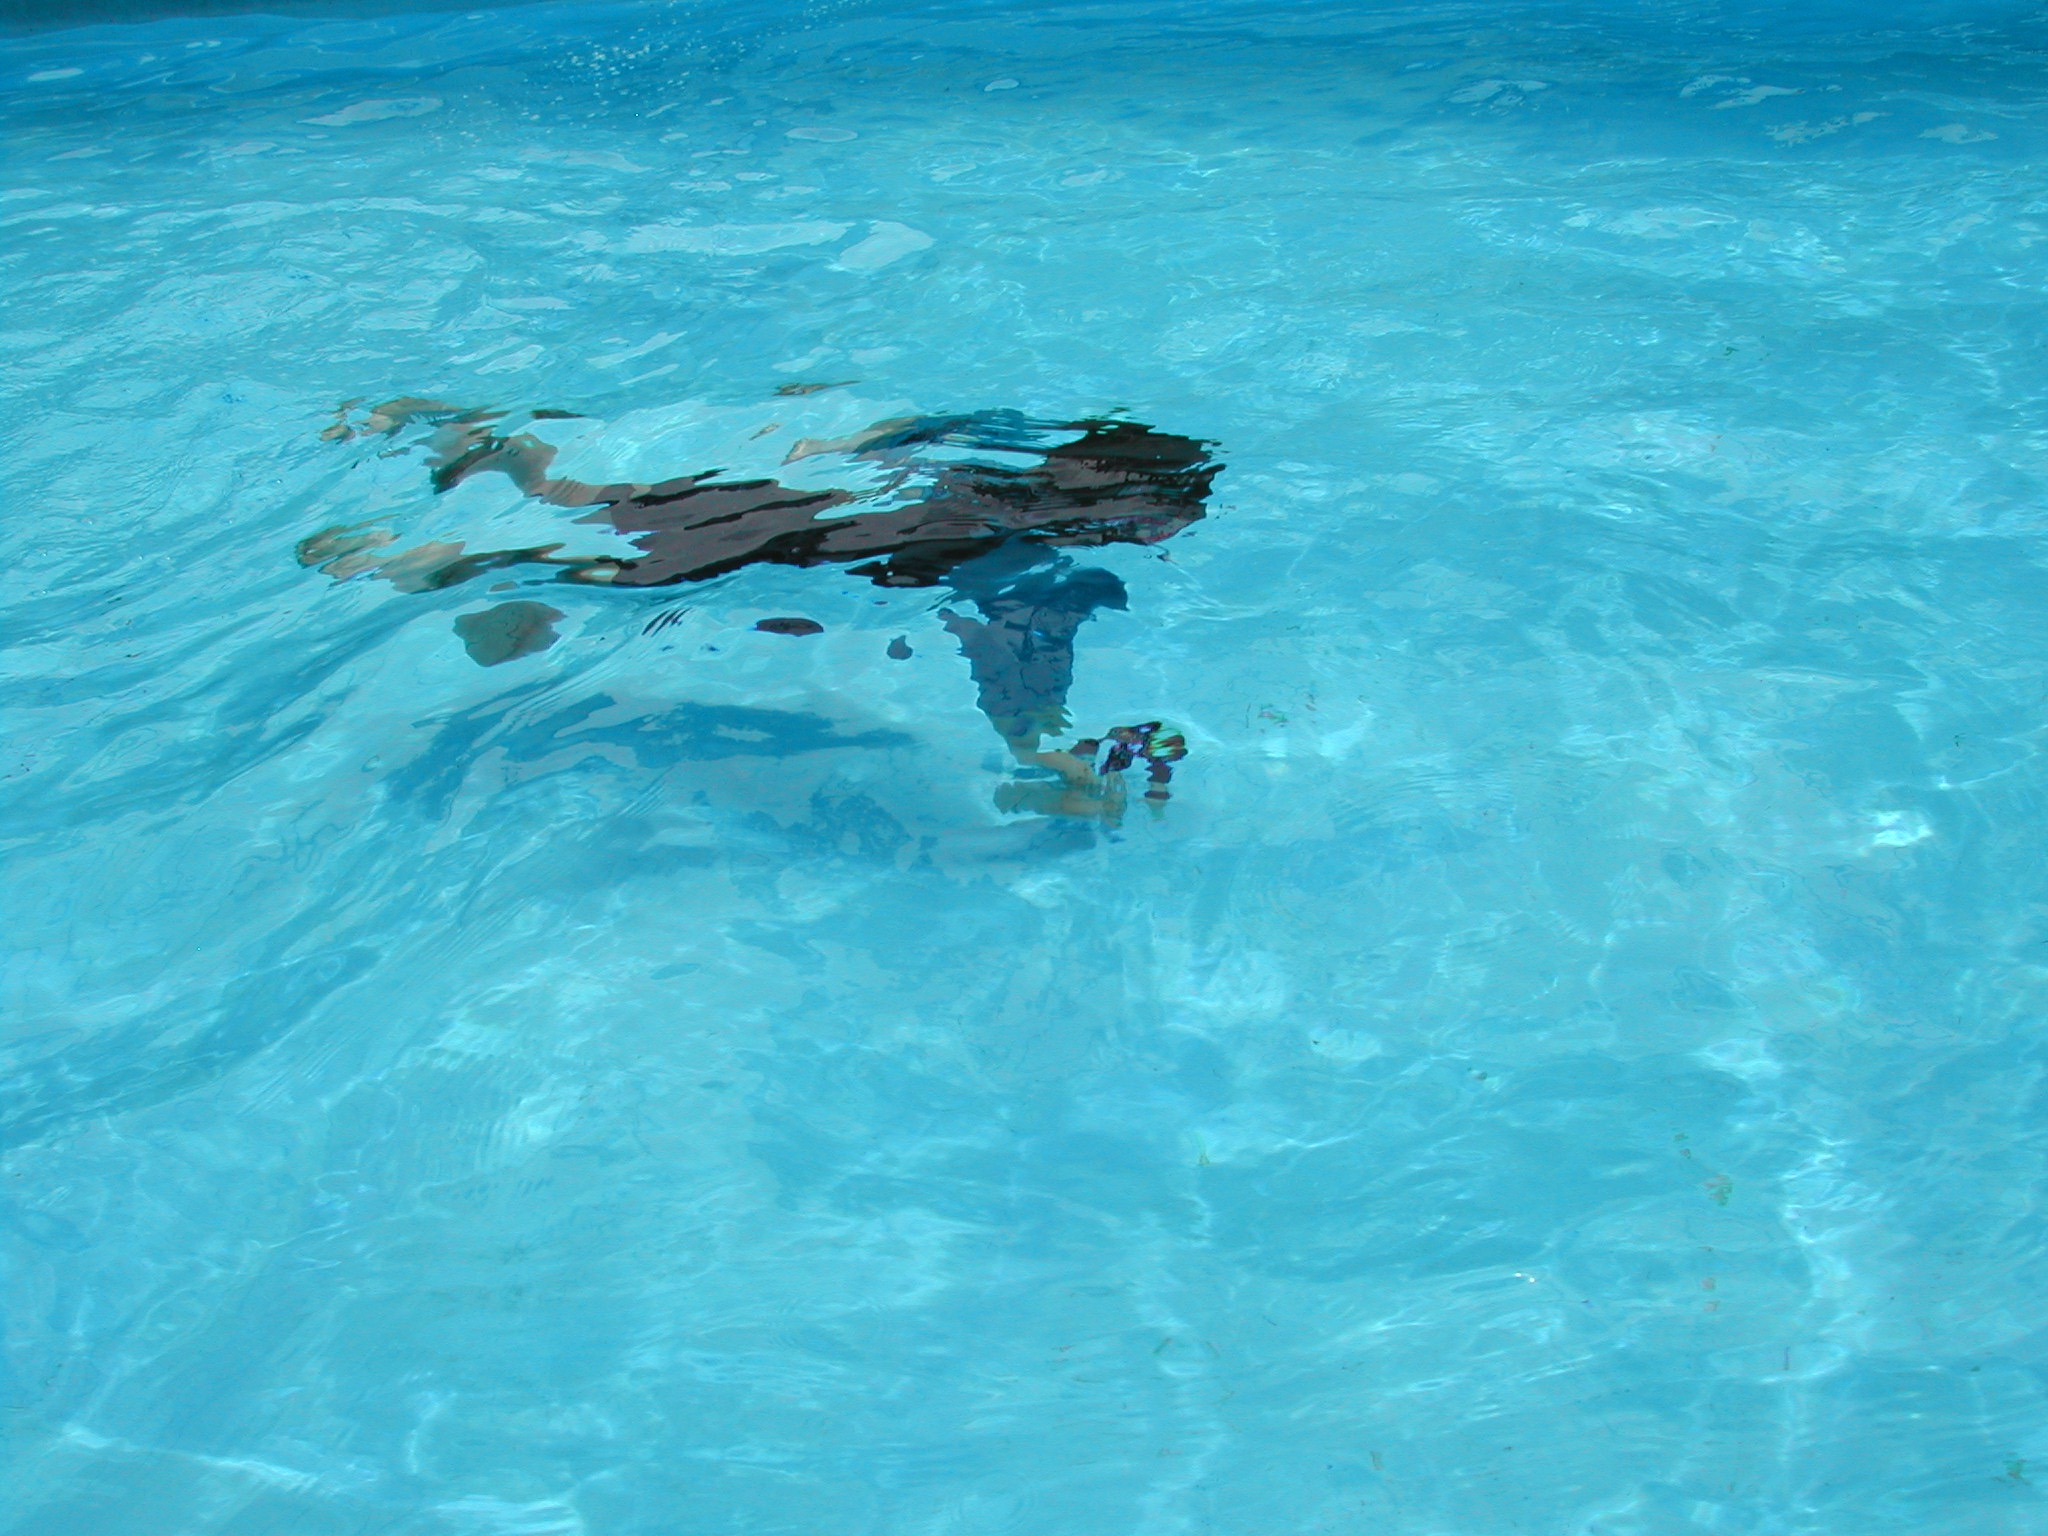 If I can swim underwater, I can breathe. I reckon.